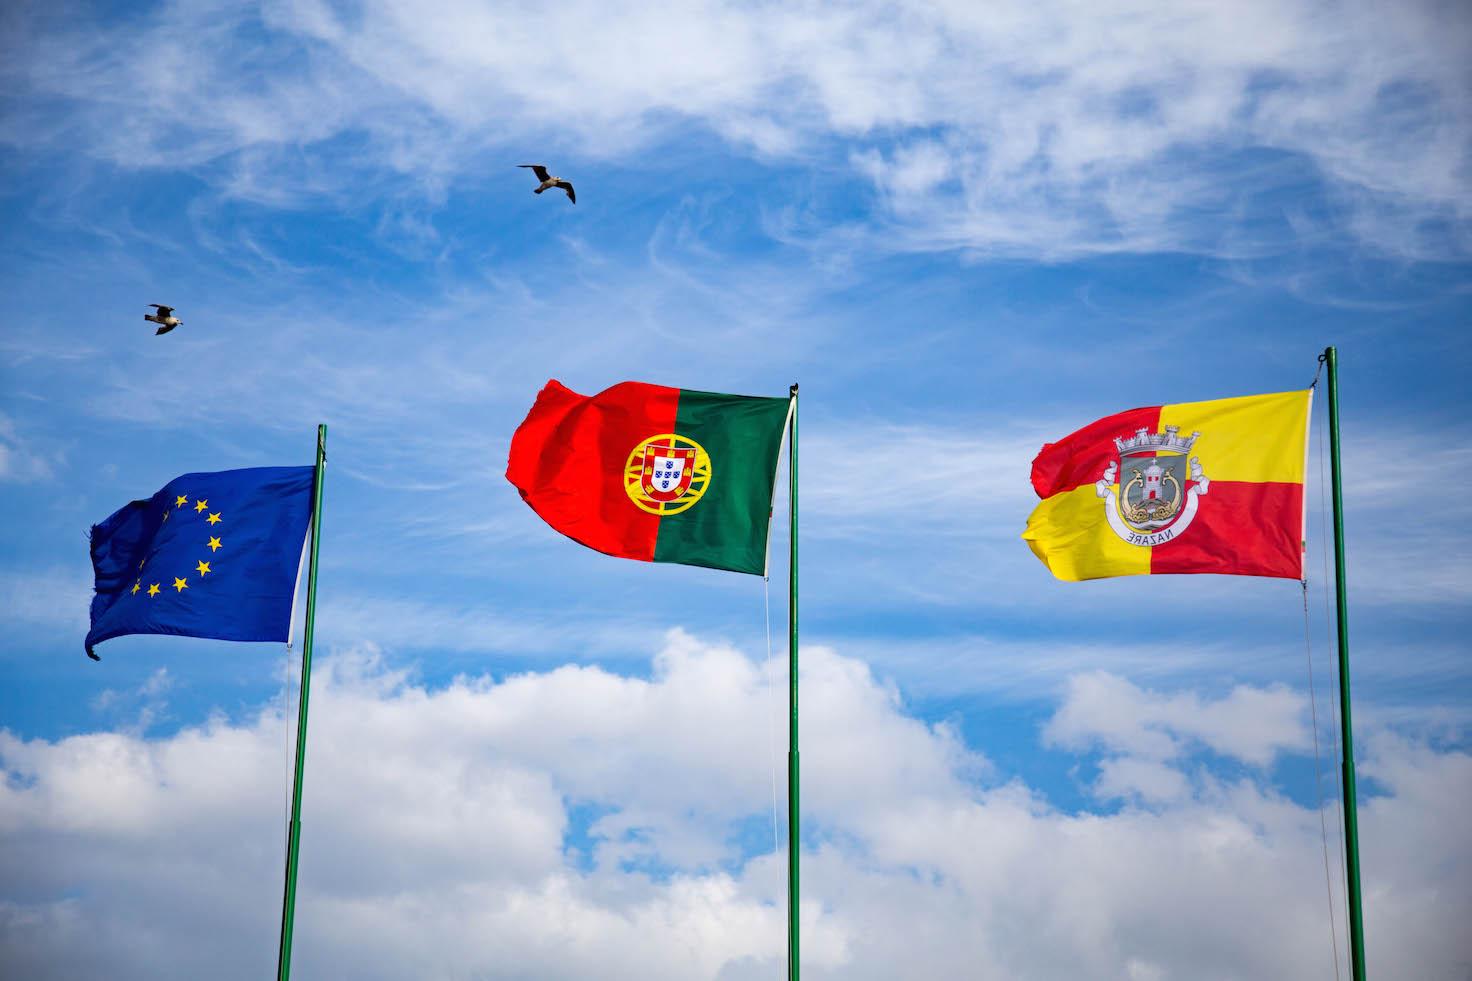 nazare-seven-skirts-portugal-moments-of-yugen-travel-blog_04